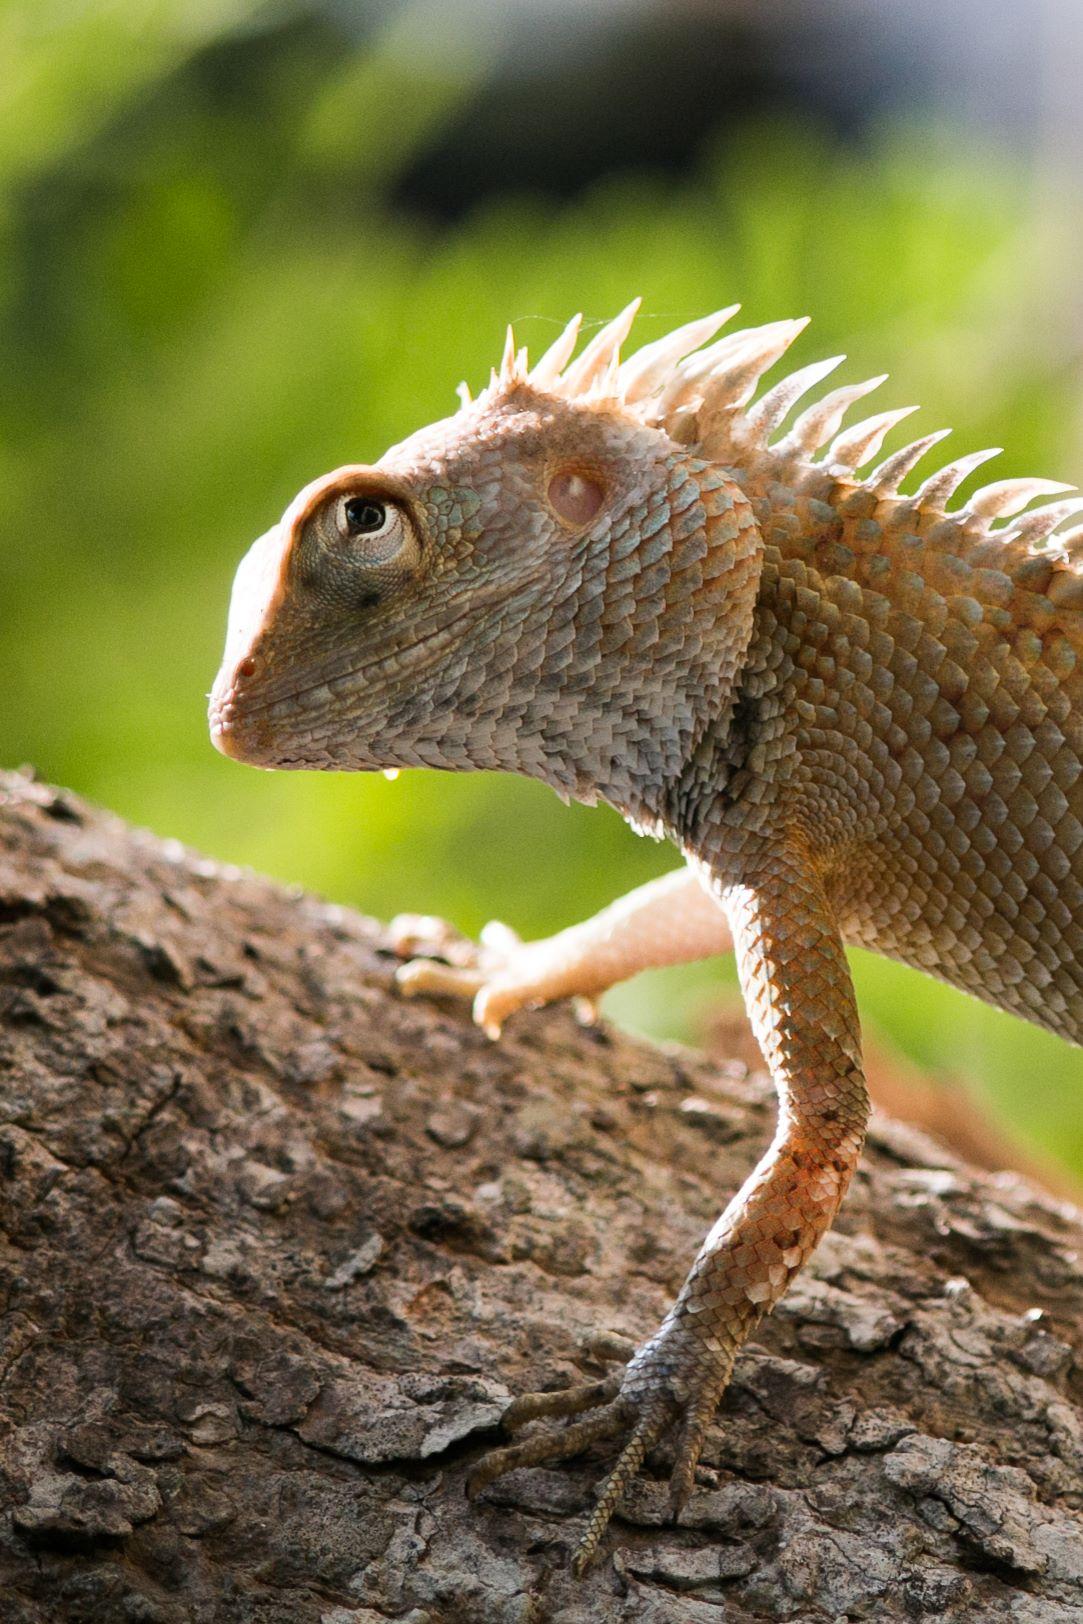 invite-to-paradise-sri-lanka-and-maldives-specialists-travel-agent-tour-operator-customer-review--feedback-joel-rhian-lizard-4.jpg